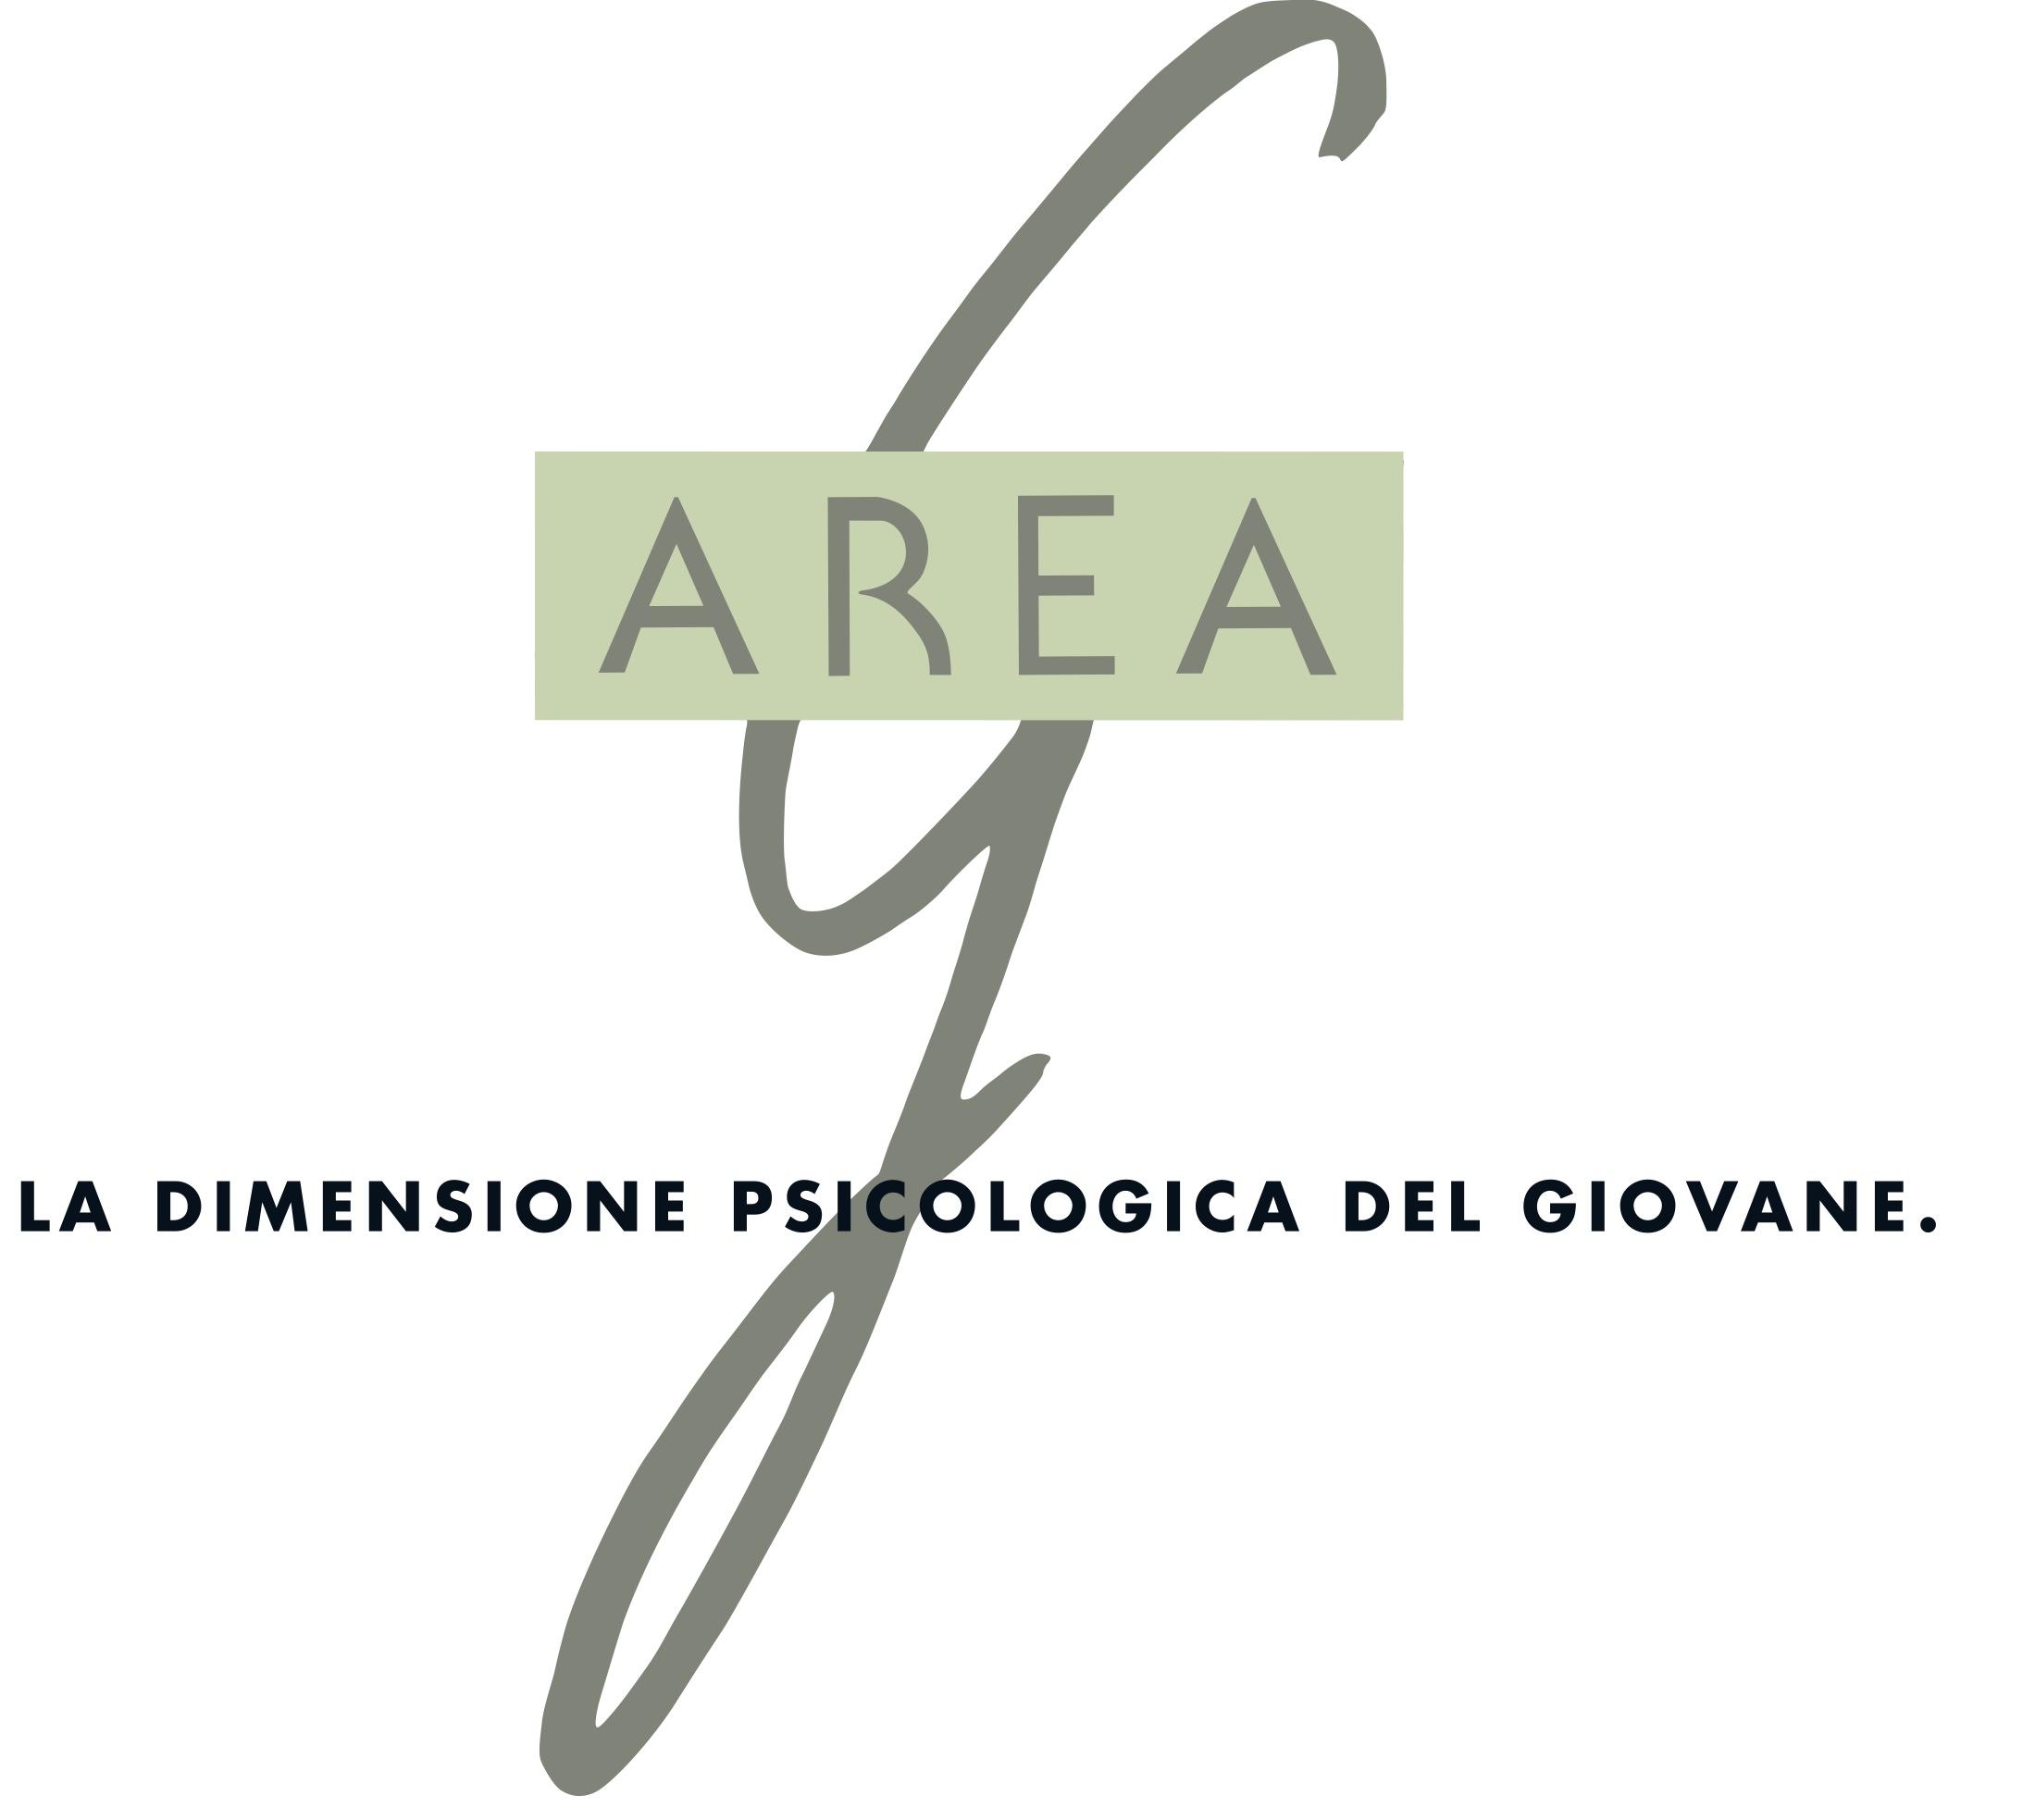 Area G